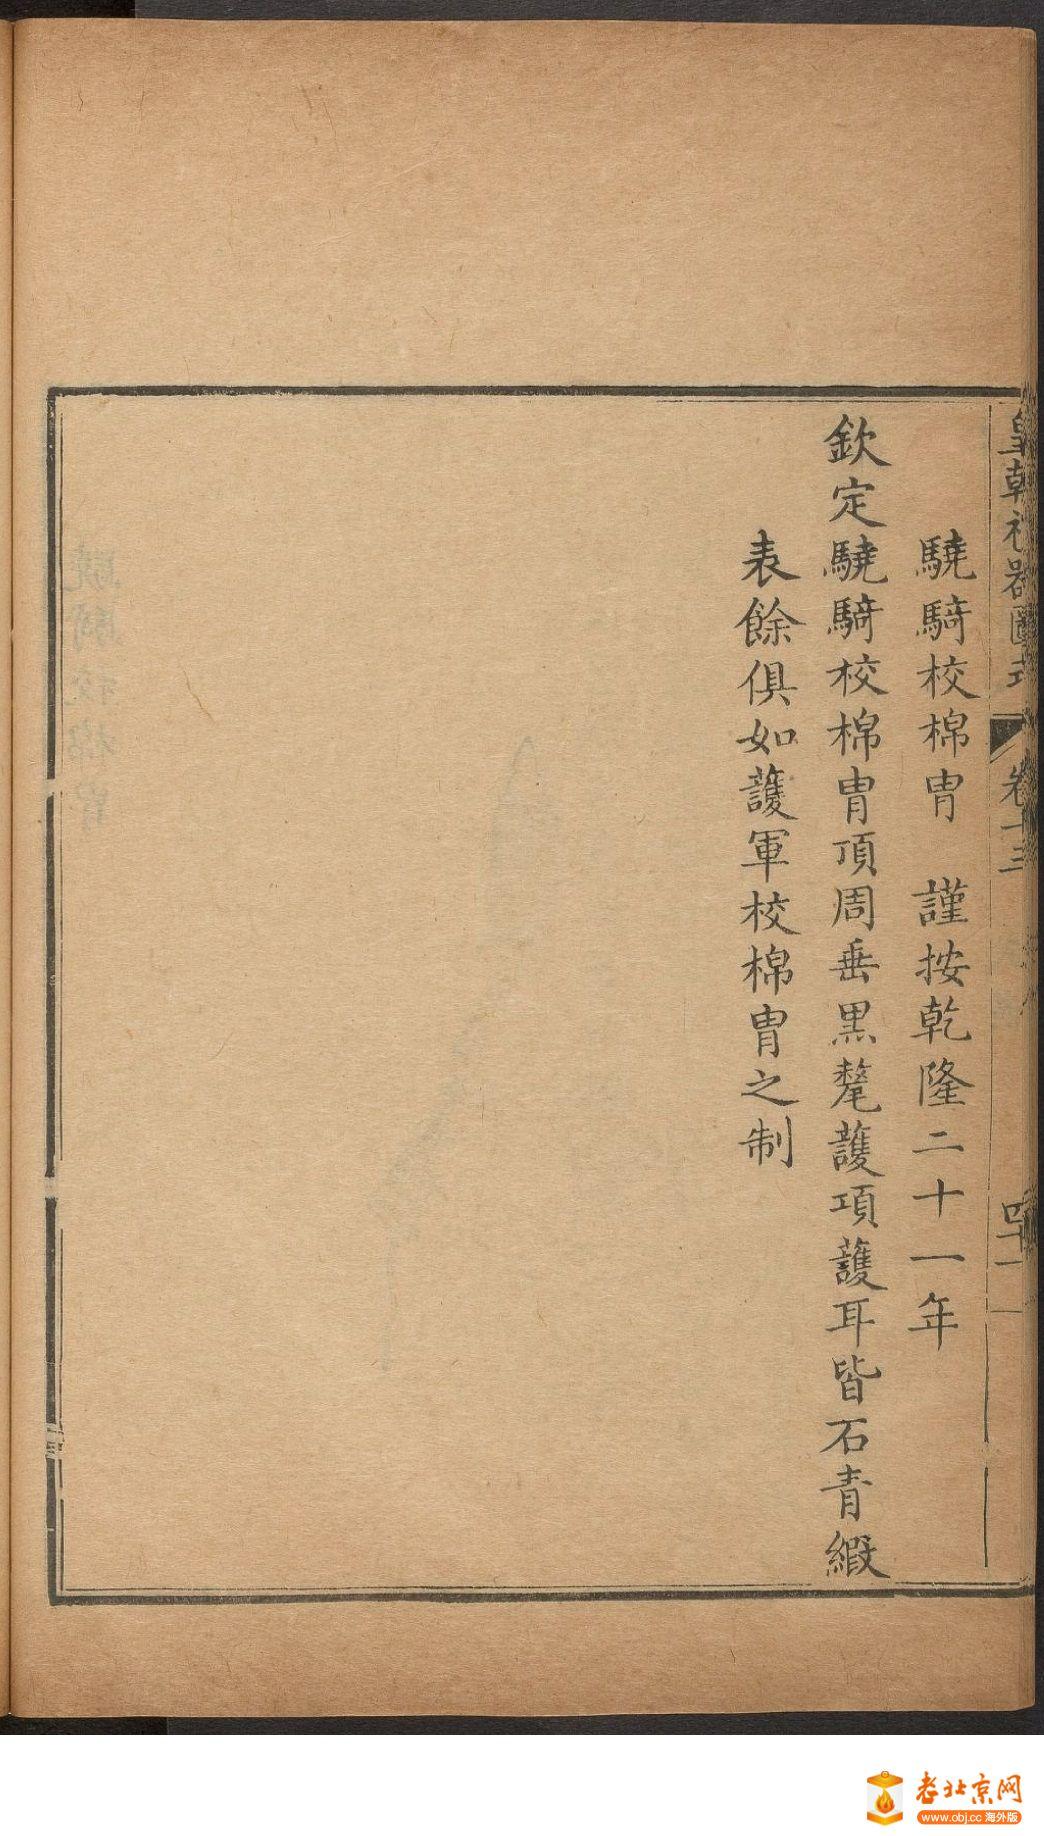 5_page2_image1b.jpg